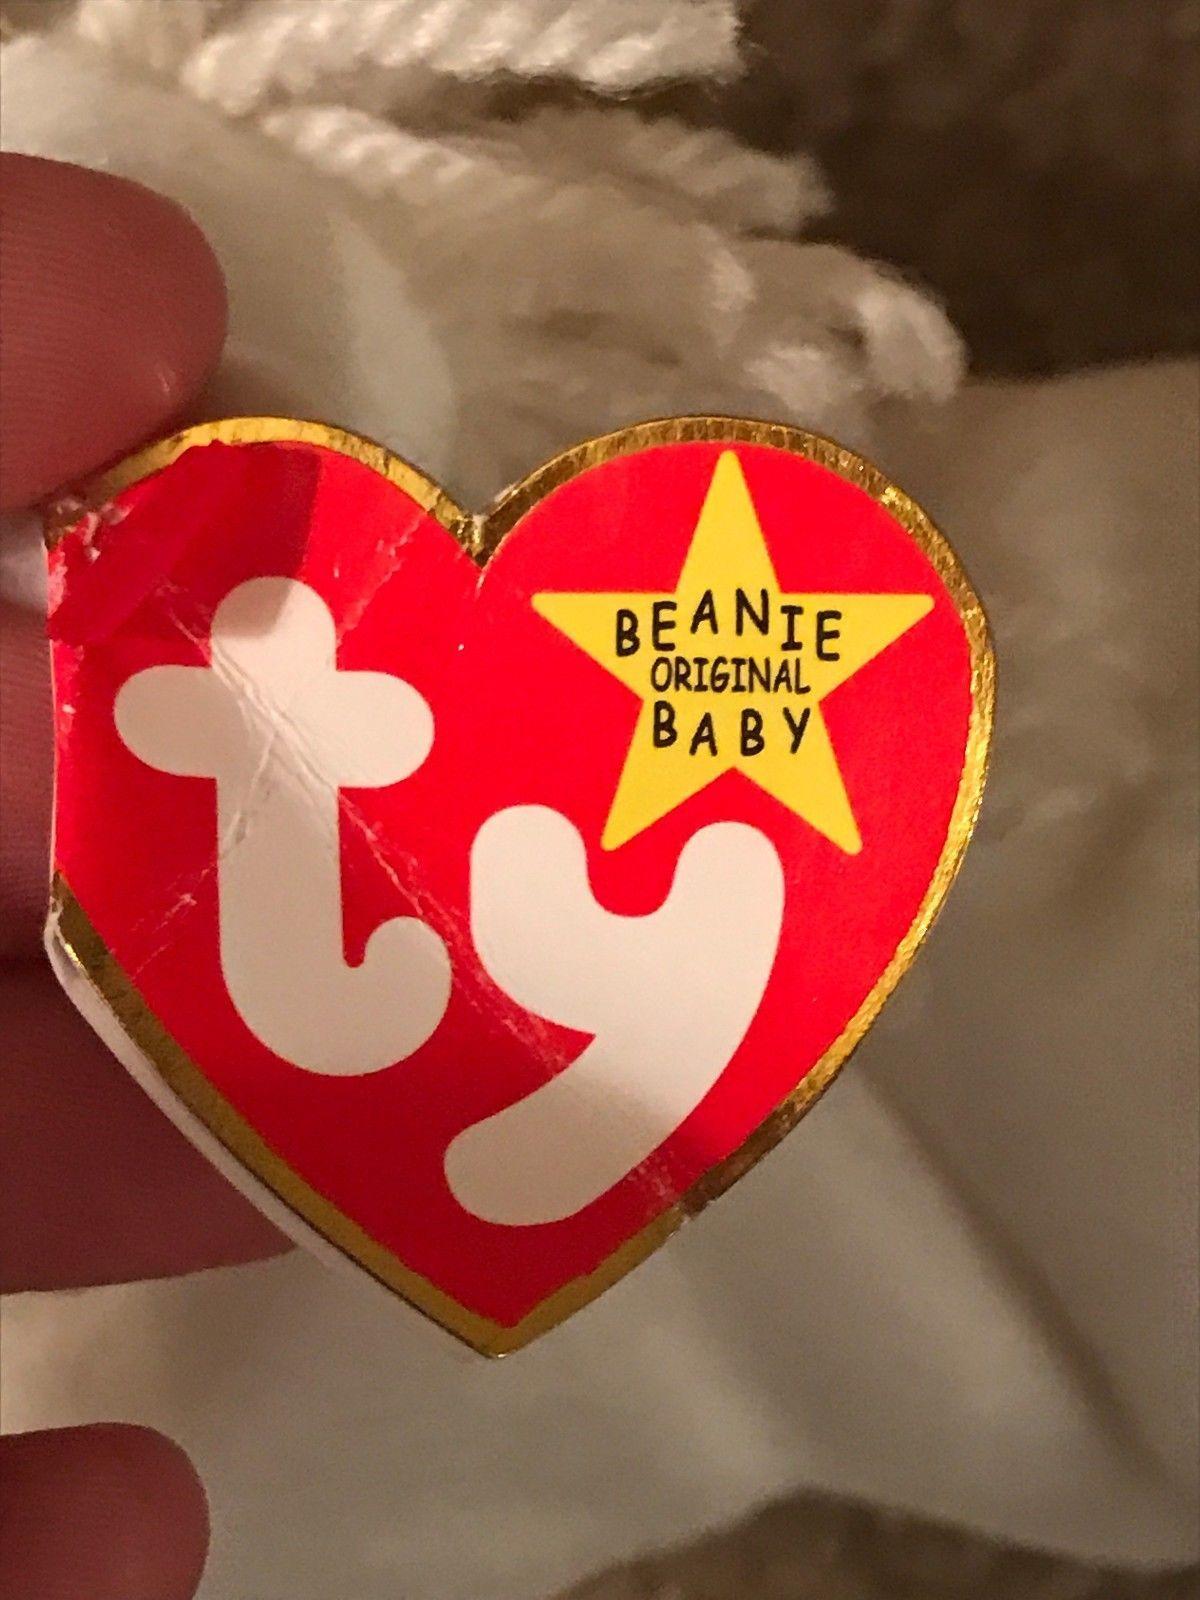 bc4330a95c1 TY Beanie Baby Original Mystic Unicorn Tag and 13 similar items